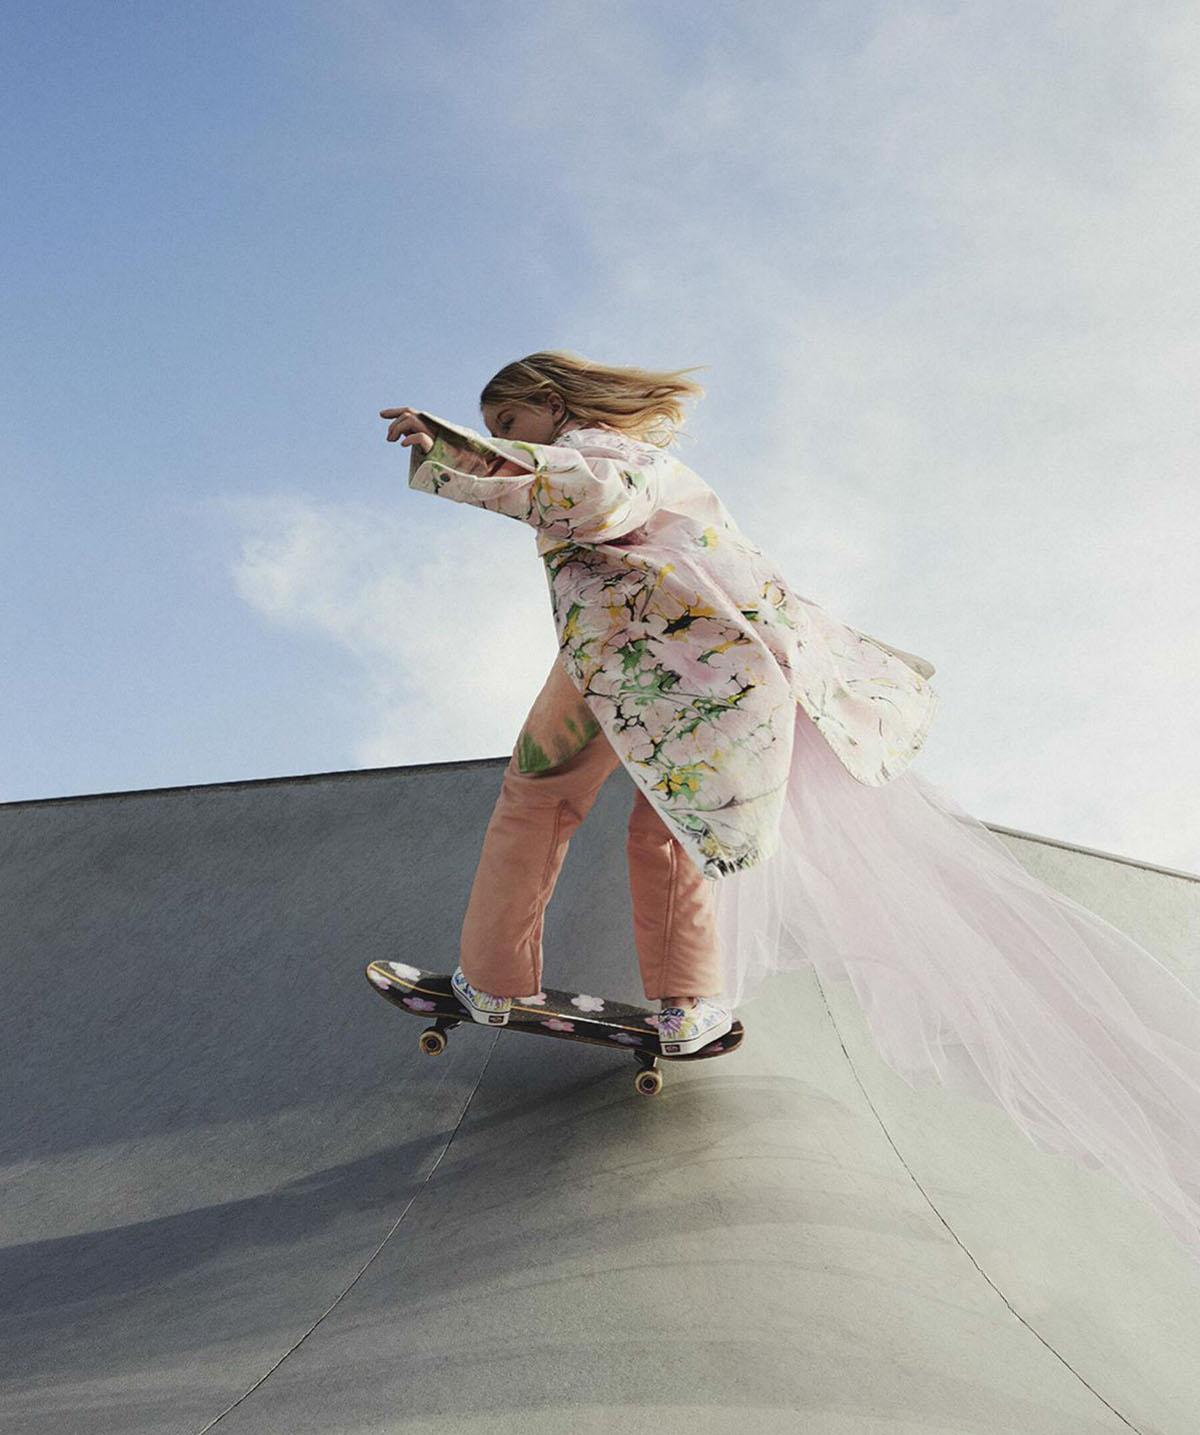 ''Air Time'' by Jesse Lizotte for Vogue Australia June 2021